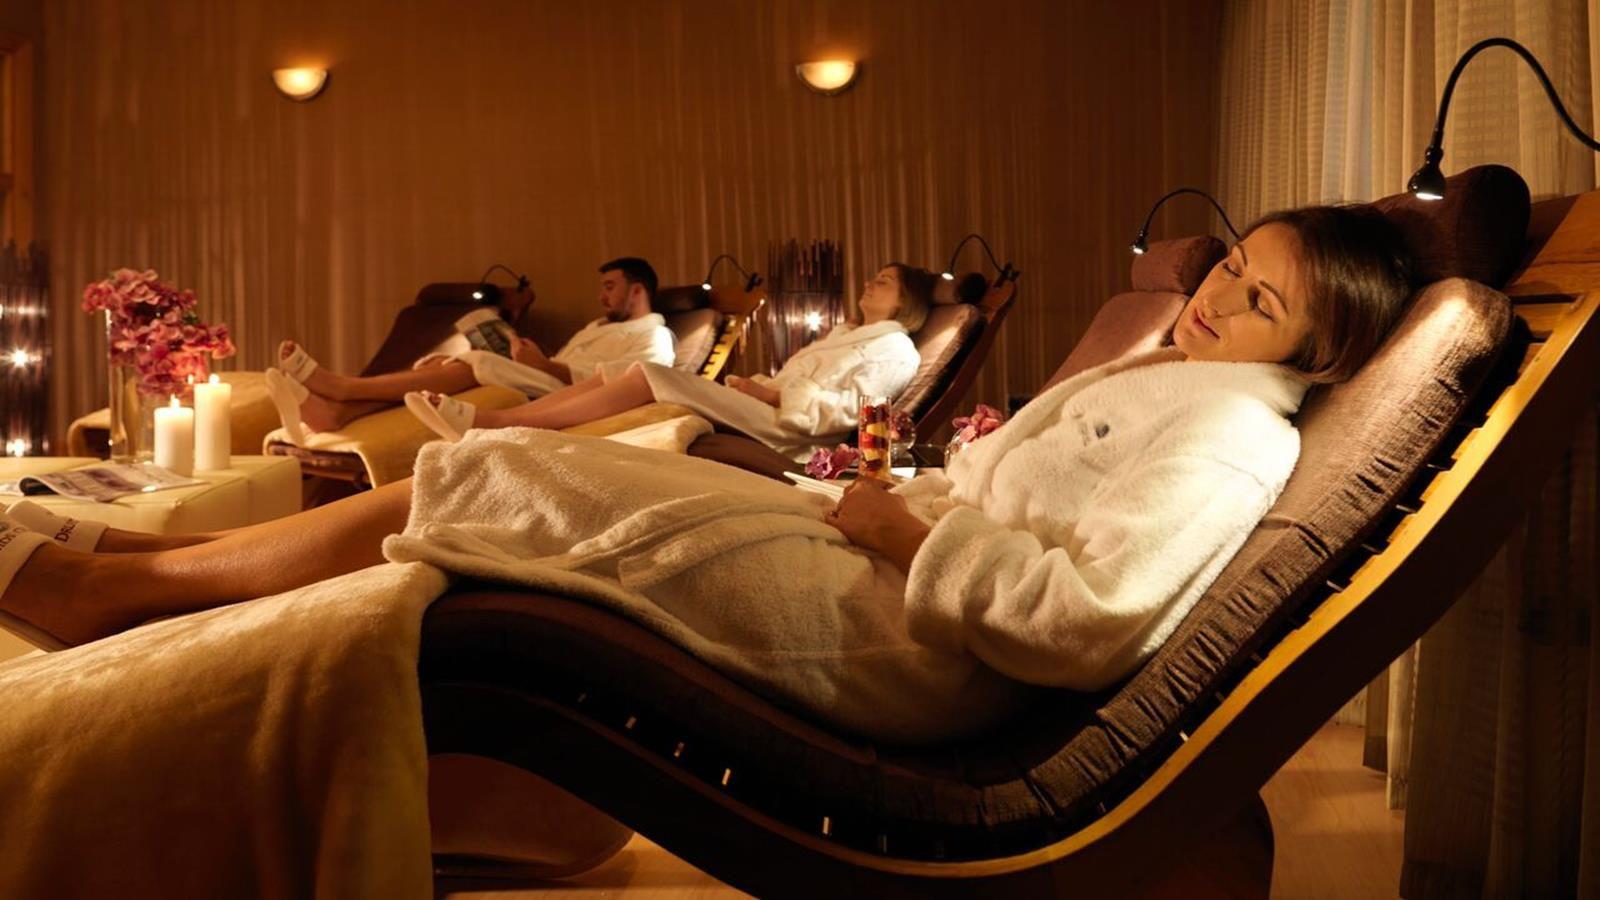 Spa hotels ireland druids glen hotel golf resort for Hotel spa paris couple